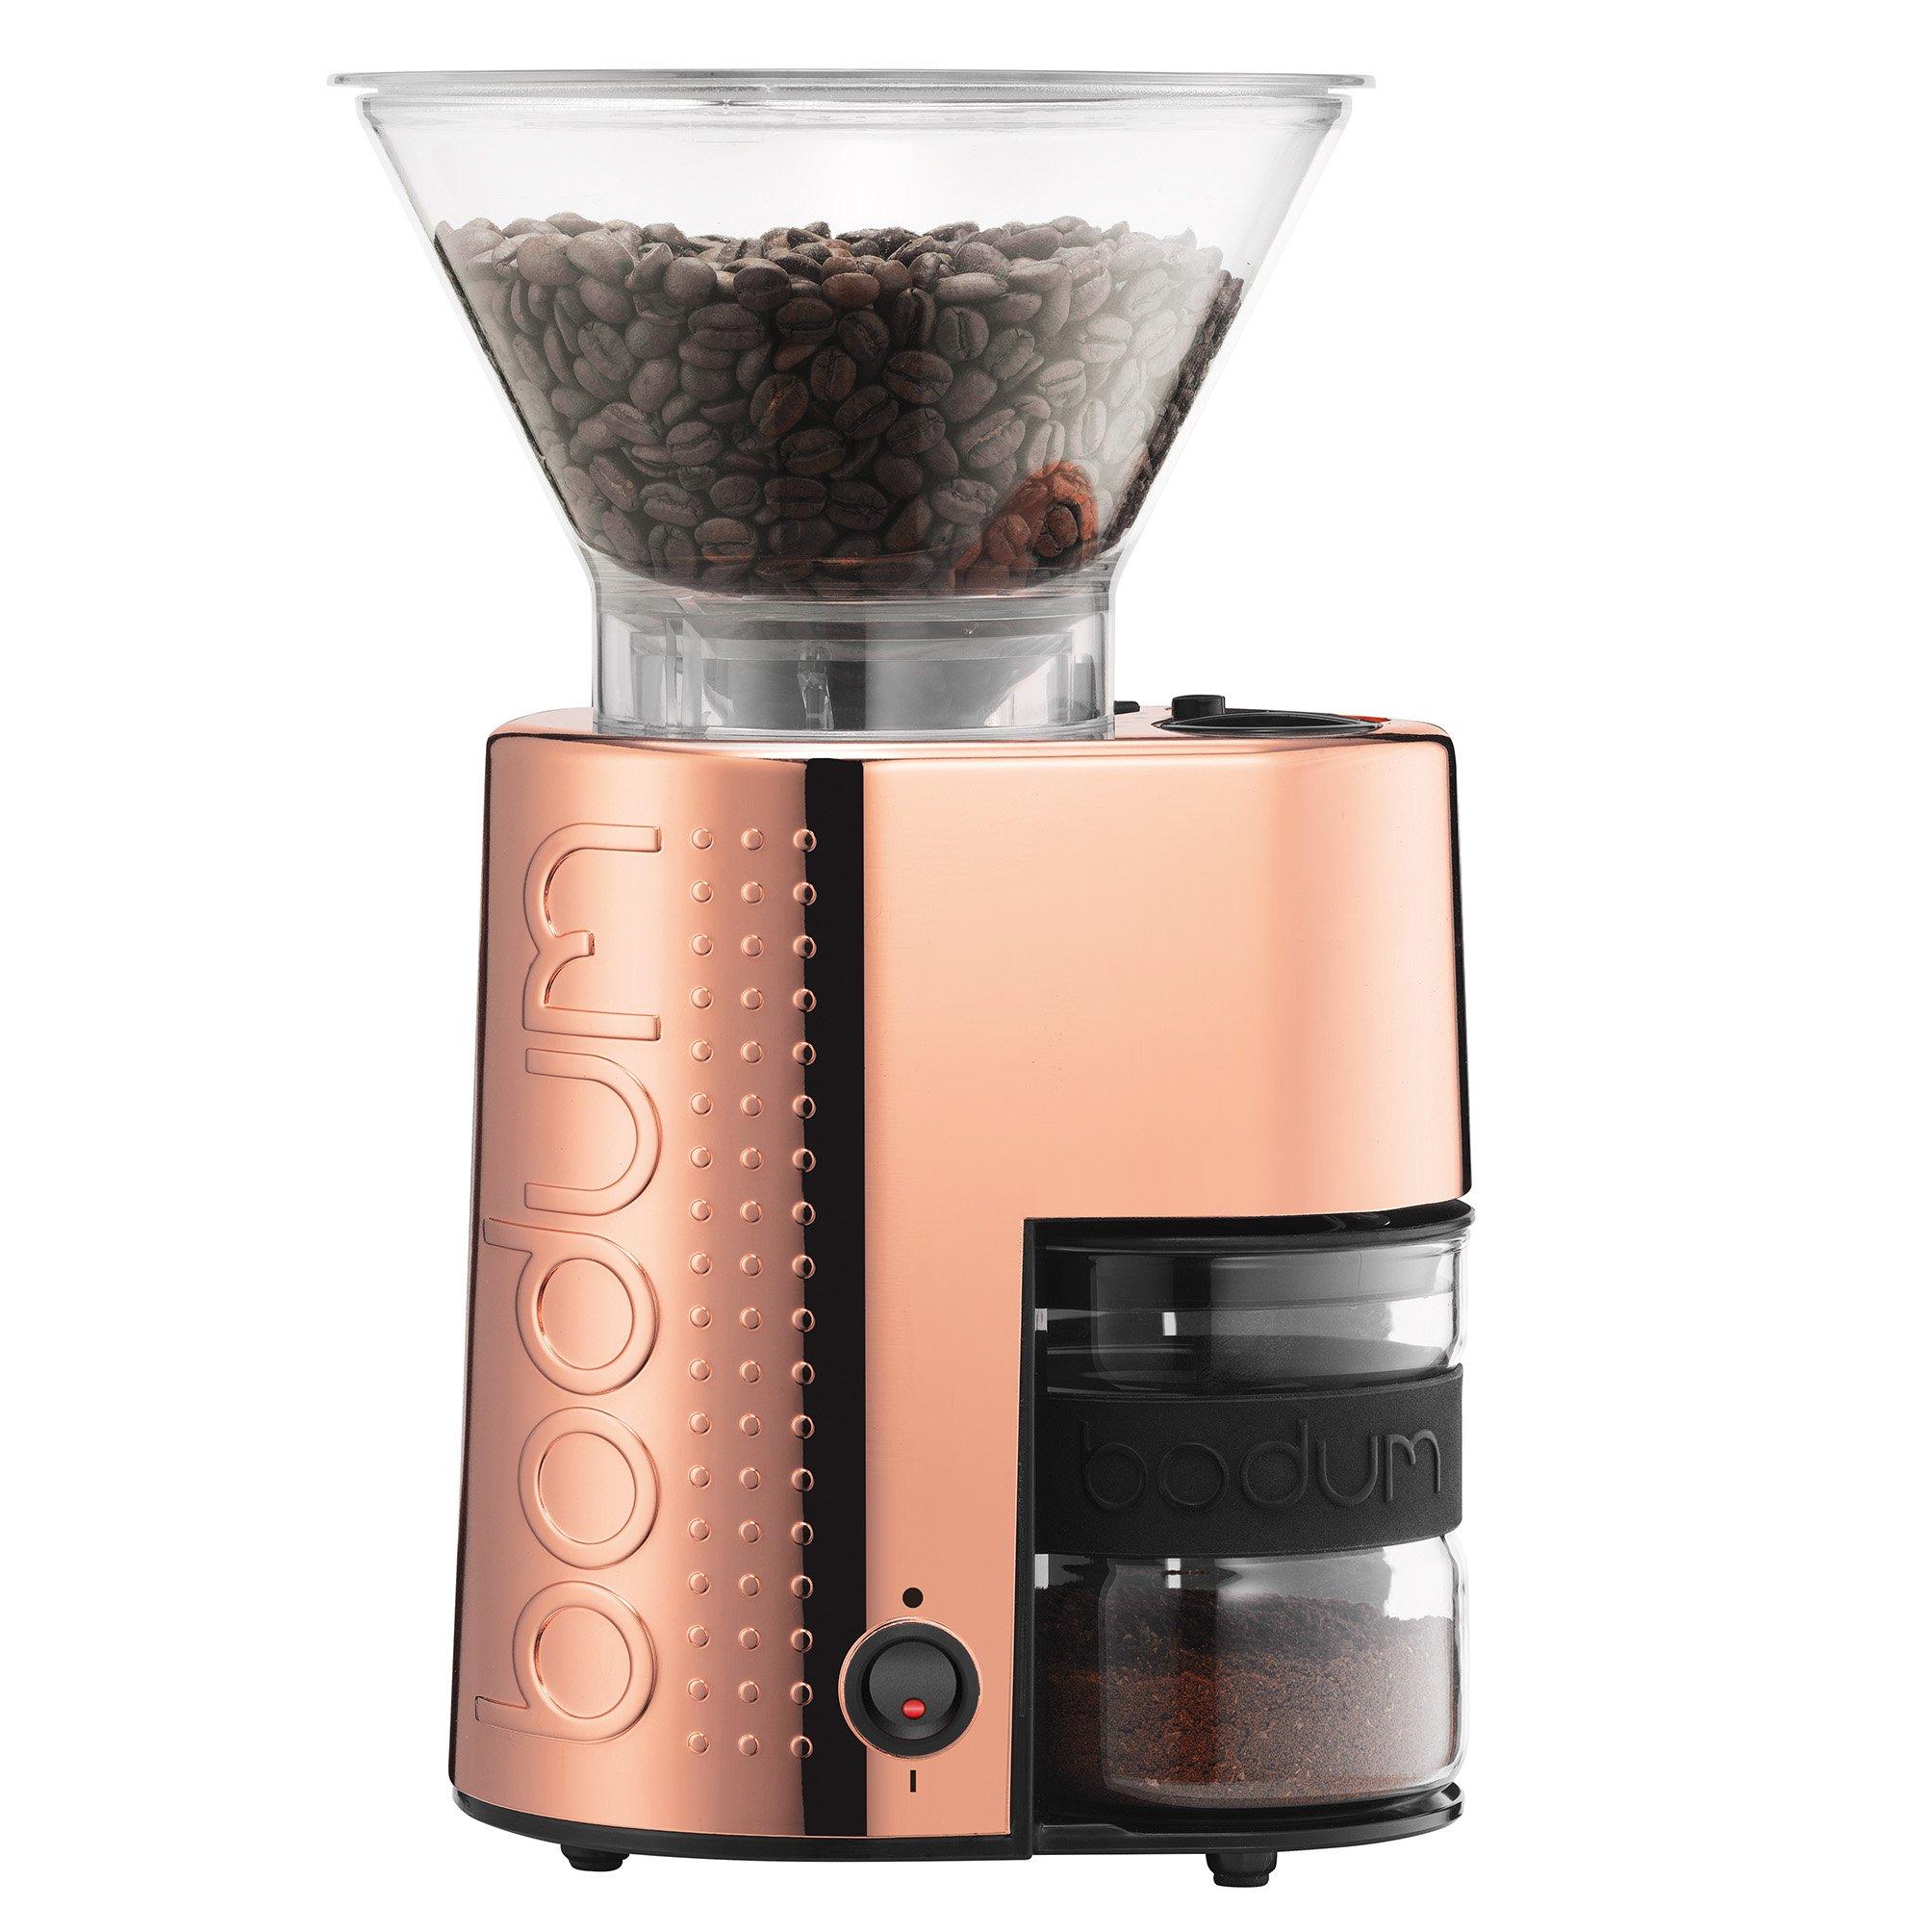 Bodum 10903-18US-1SB Bistro Coffee Grinder, Shiny Copper by Bodum (Image #1)